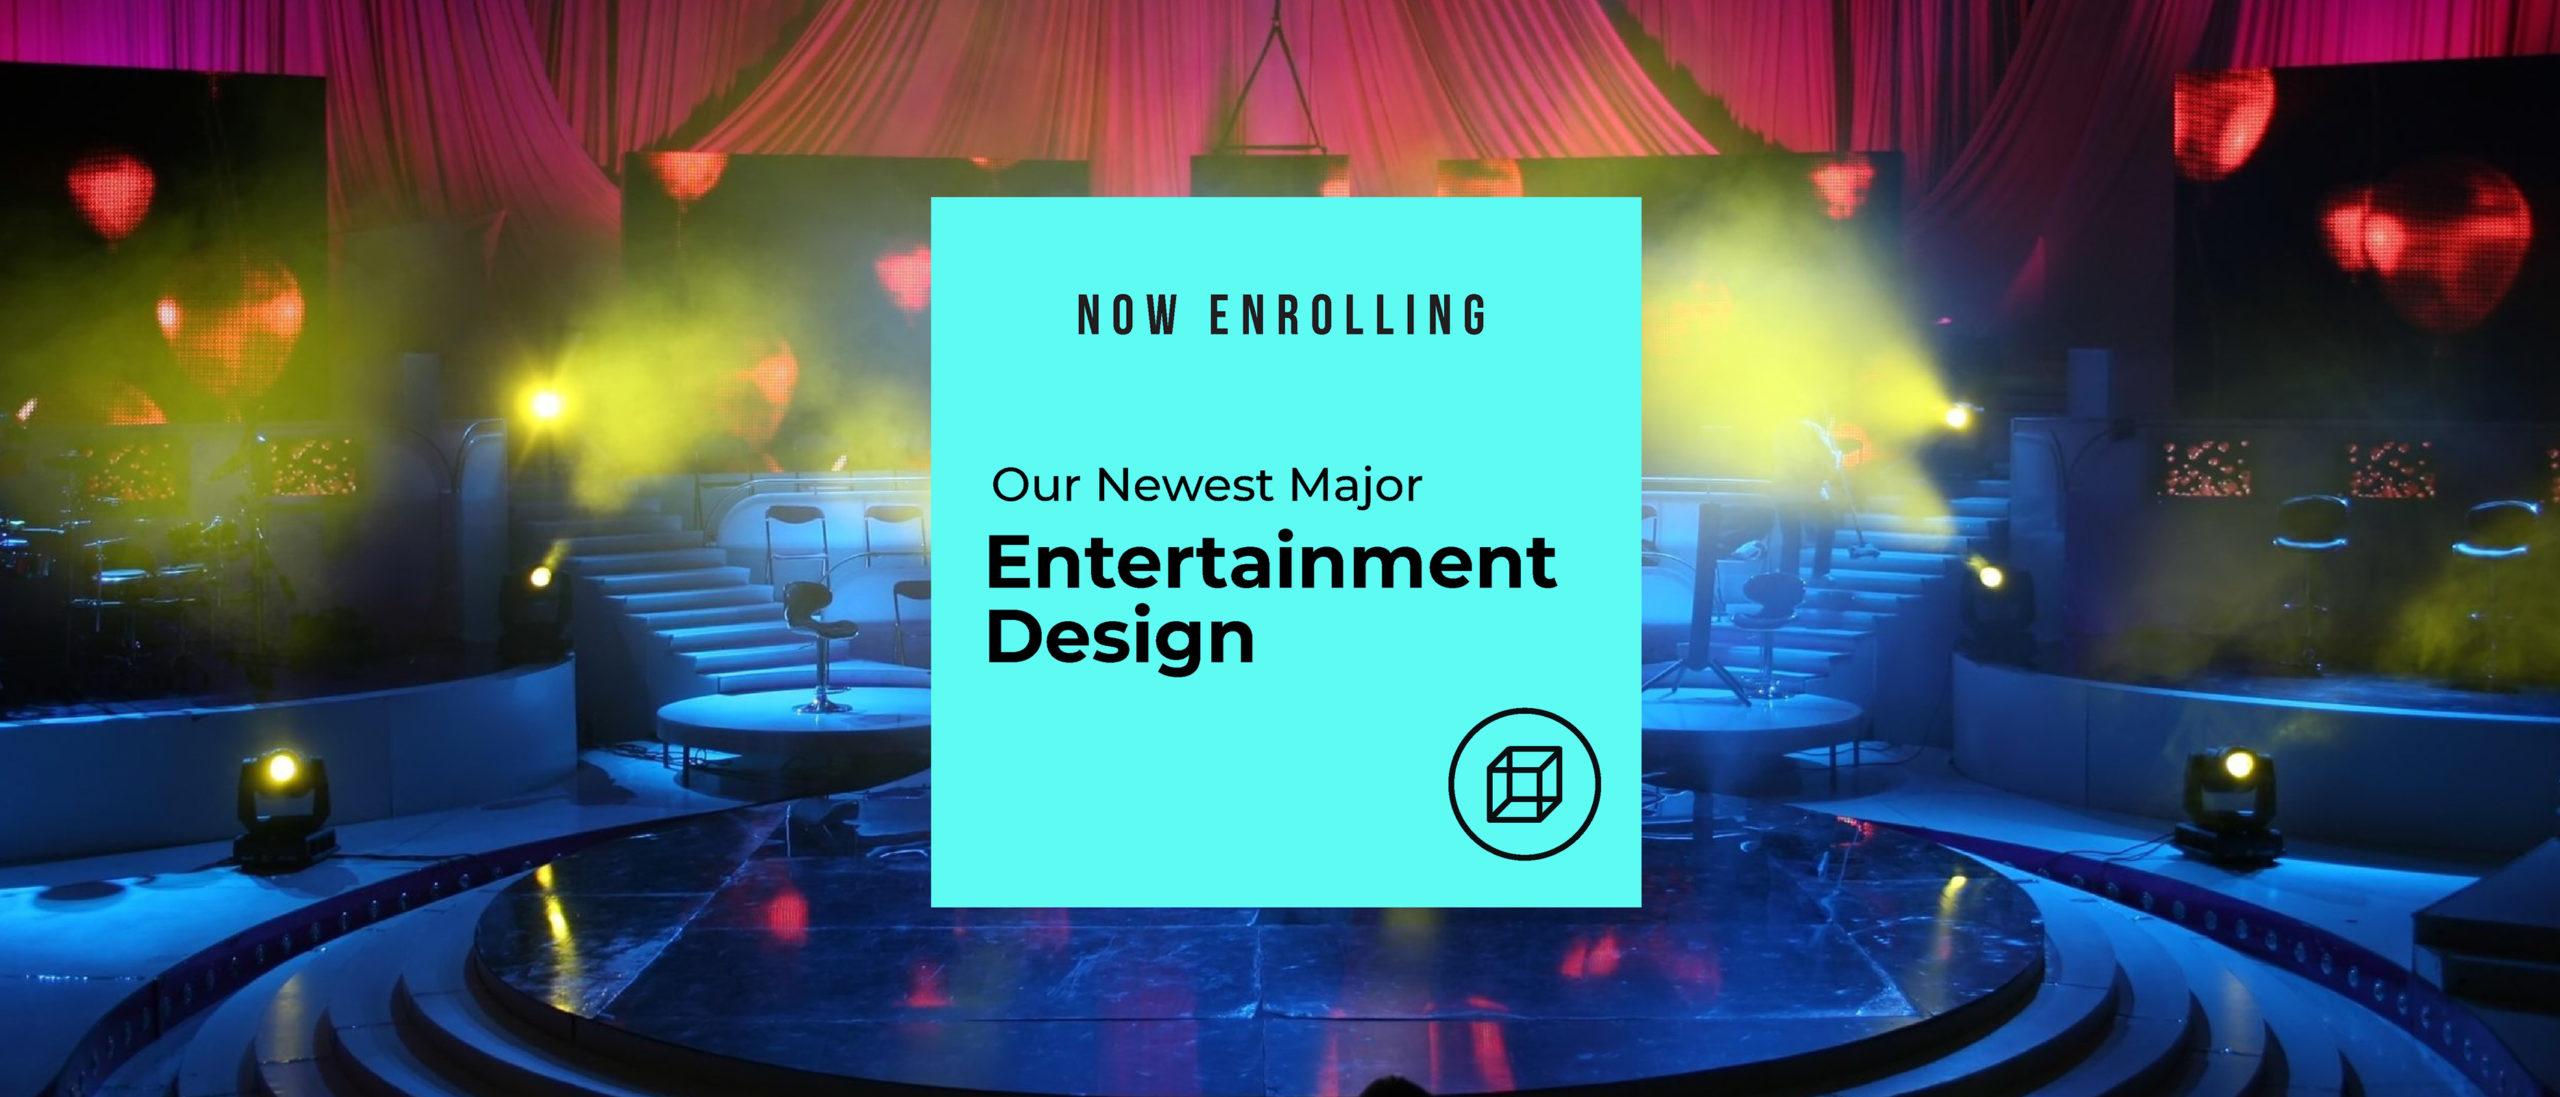 Entertainment Design banner image